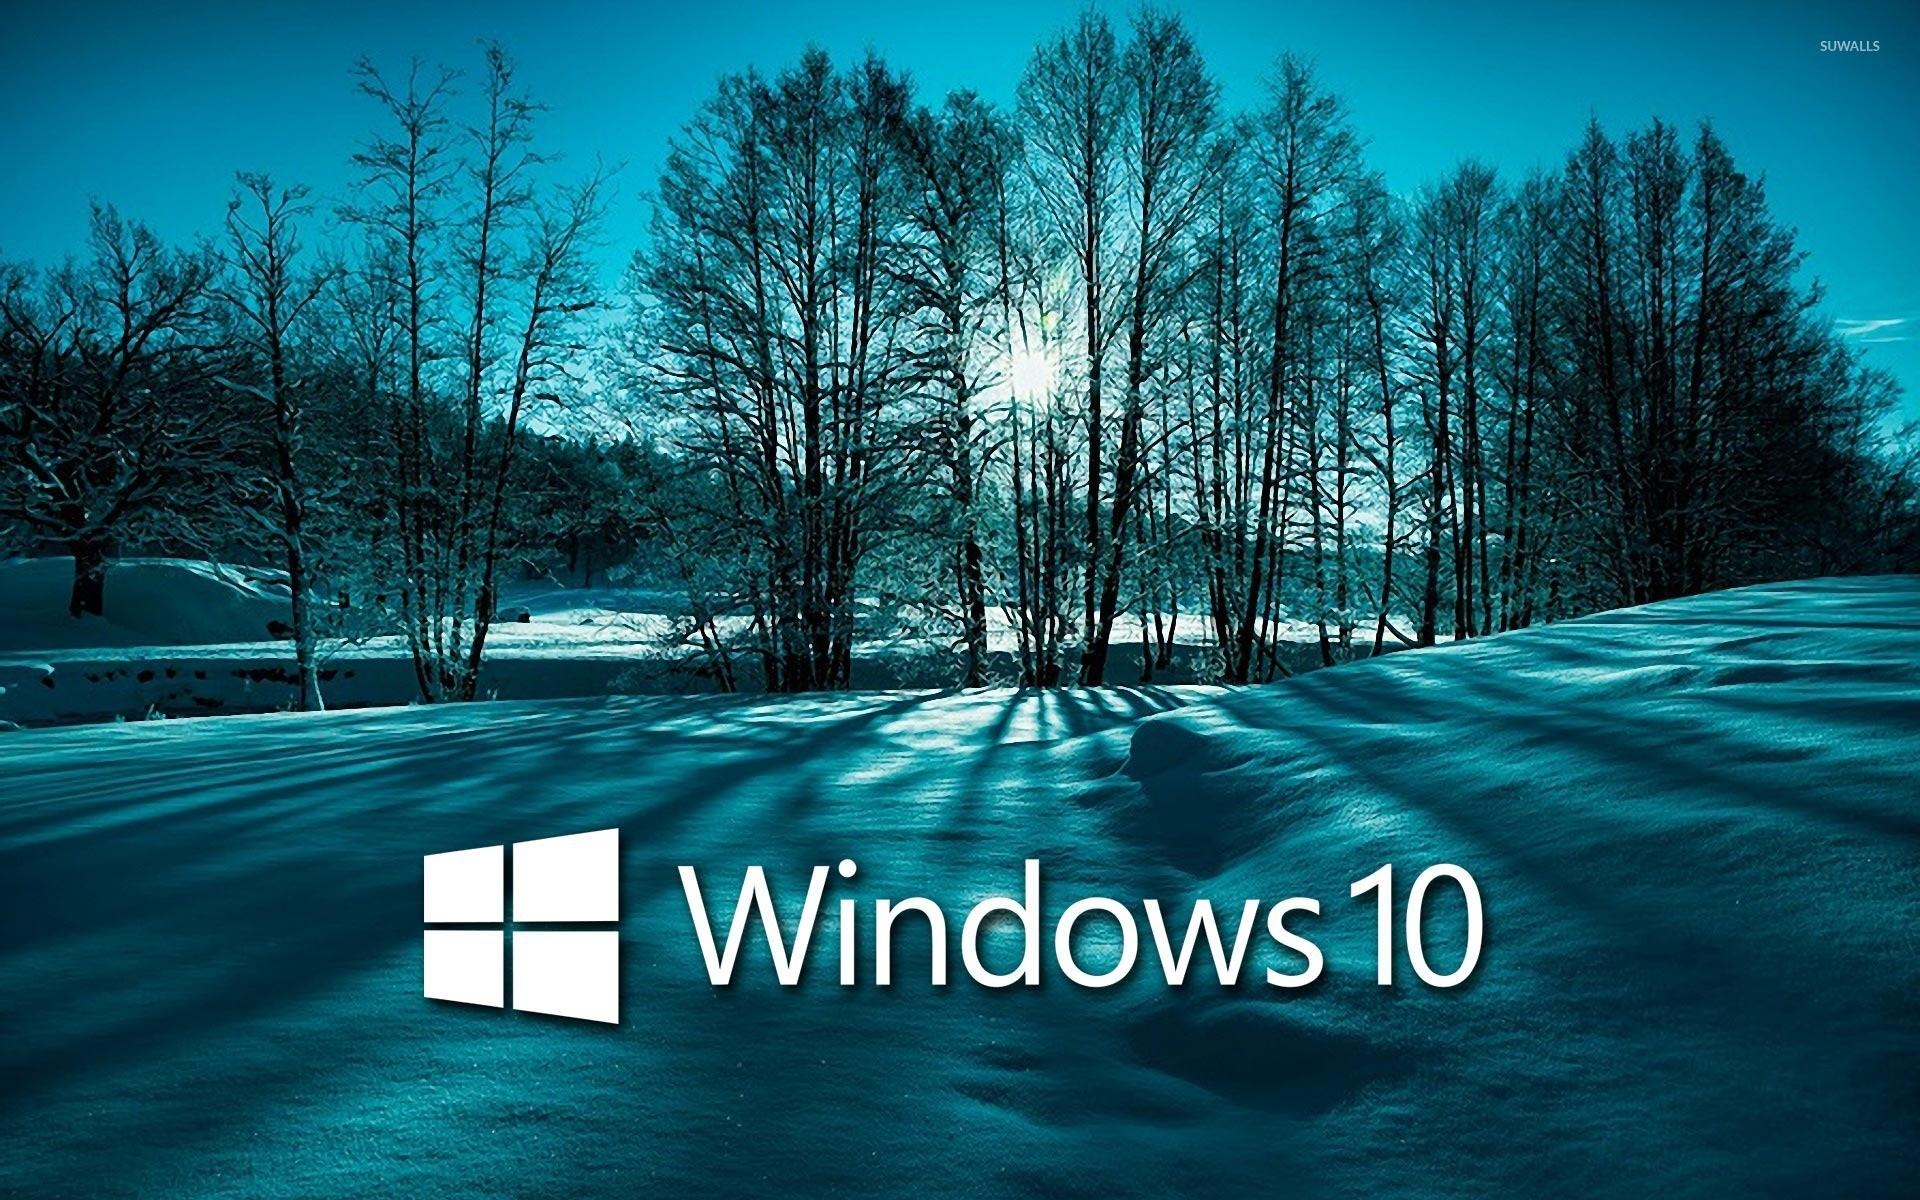 windows 10 wallpaper download,natural landscape,sky,winter,tree,water